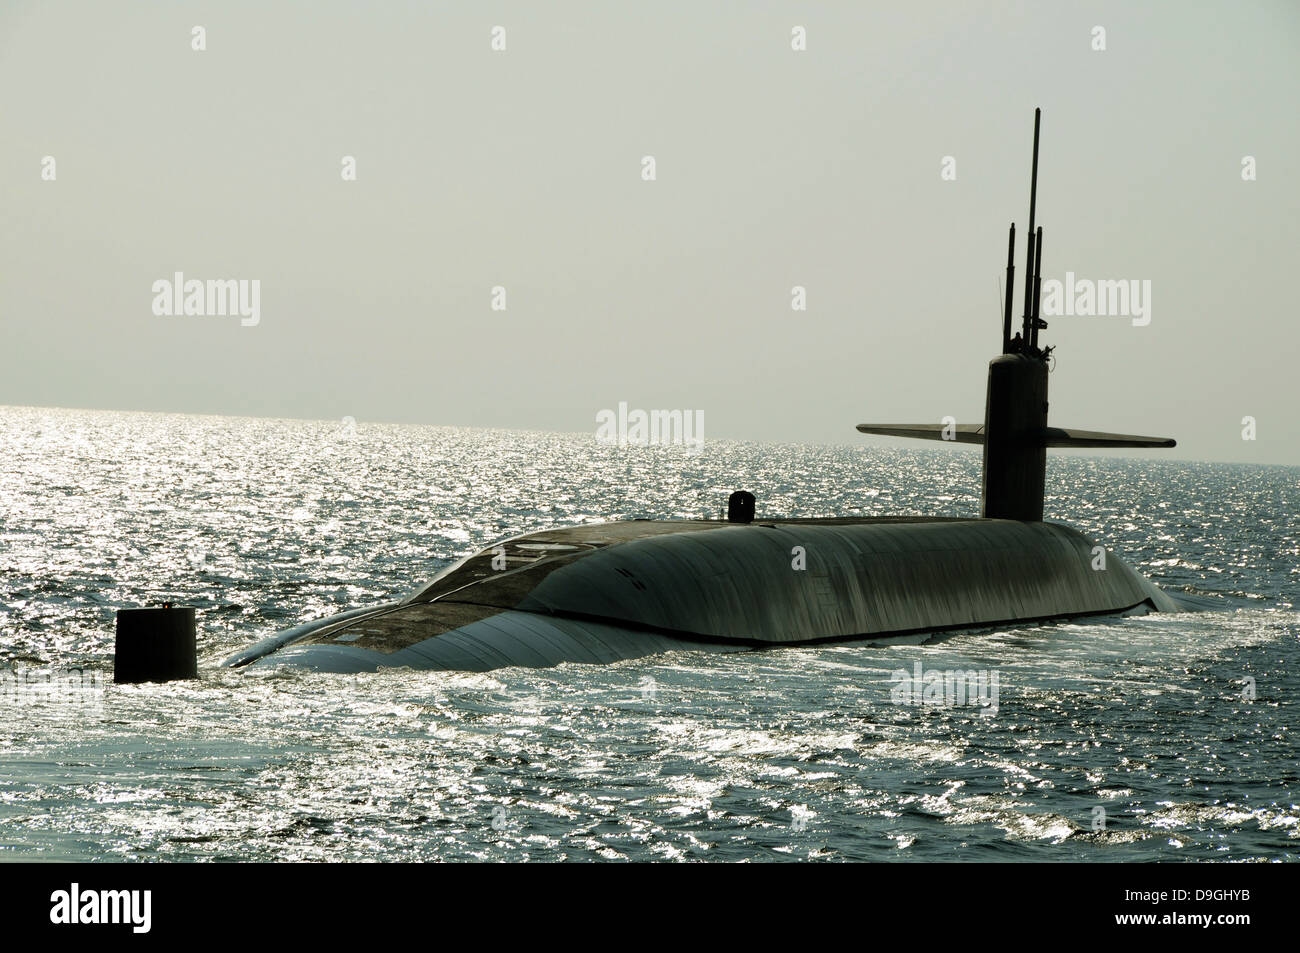 El misil balístico submarino USS Maryland. Imagen De Stock